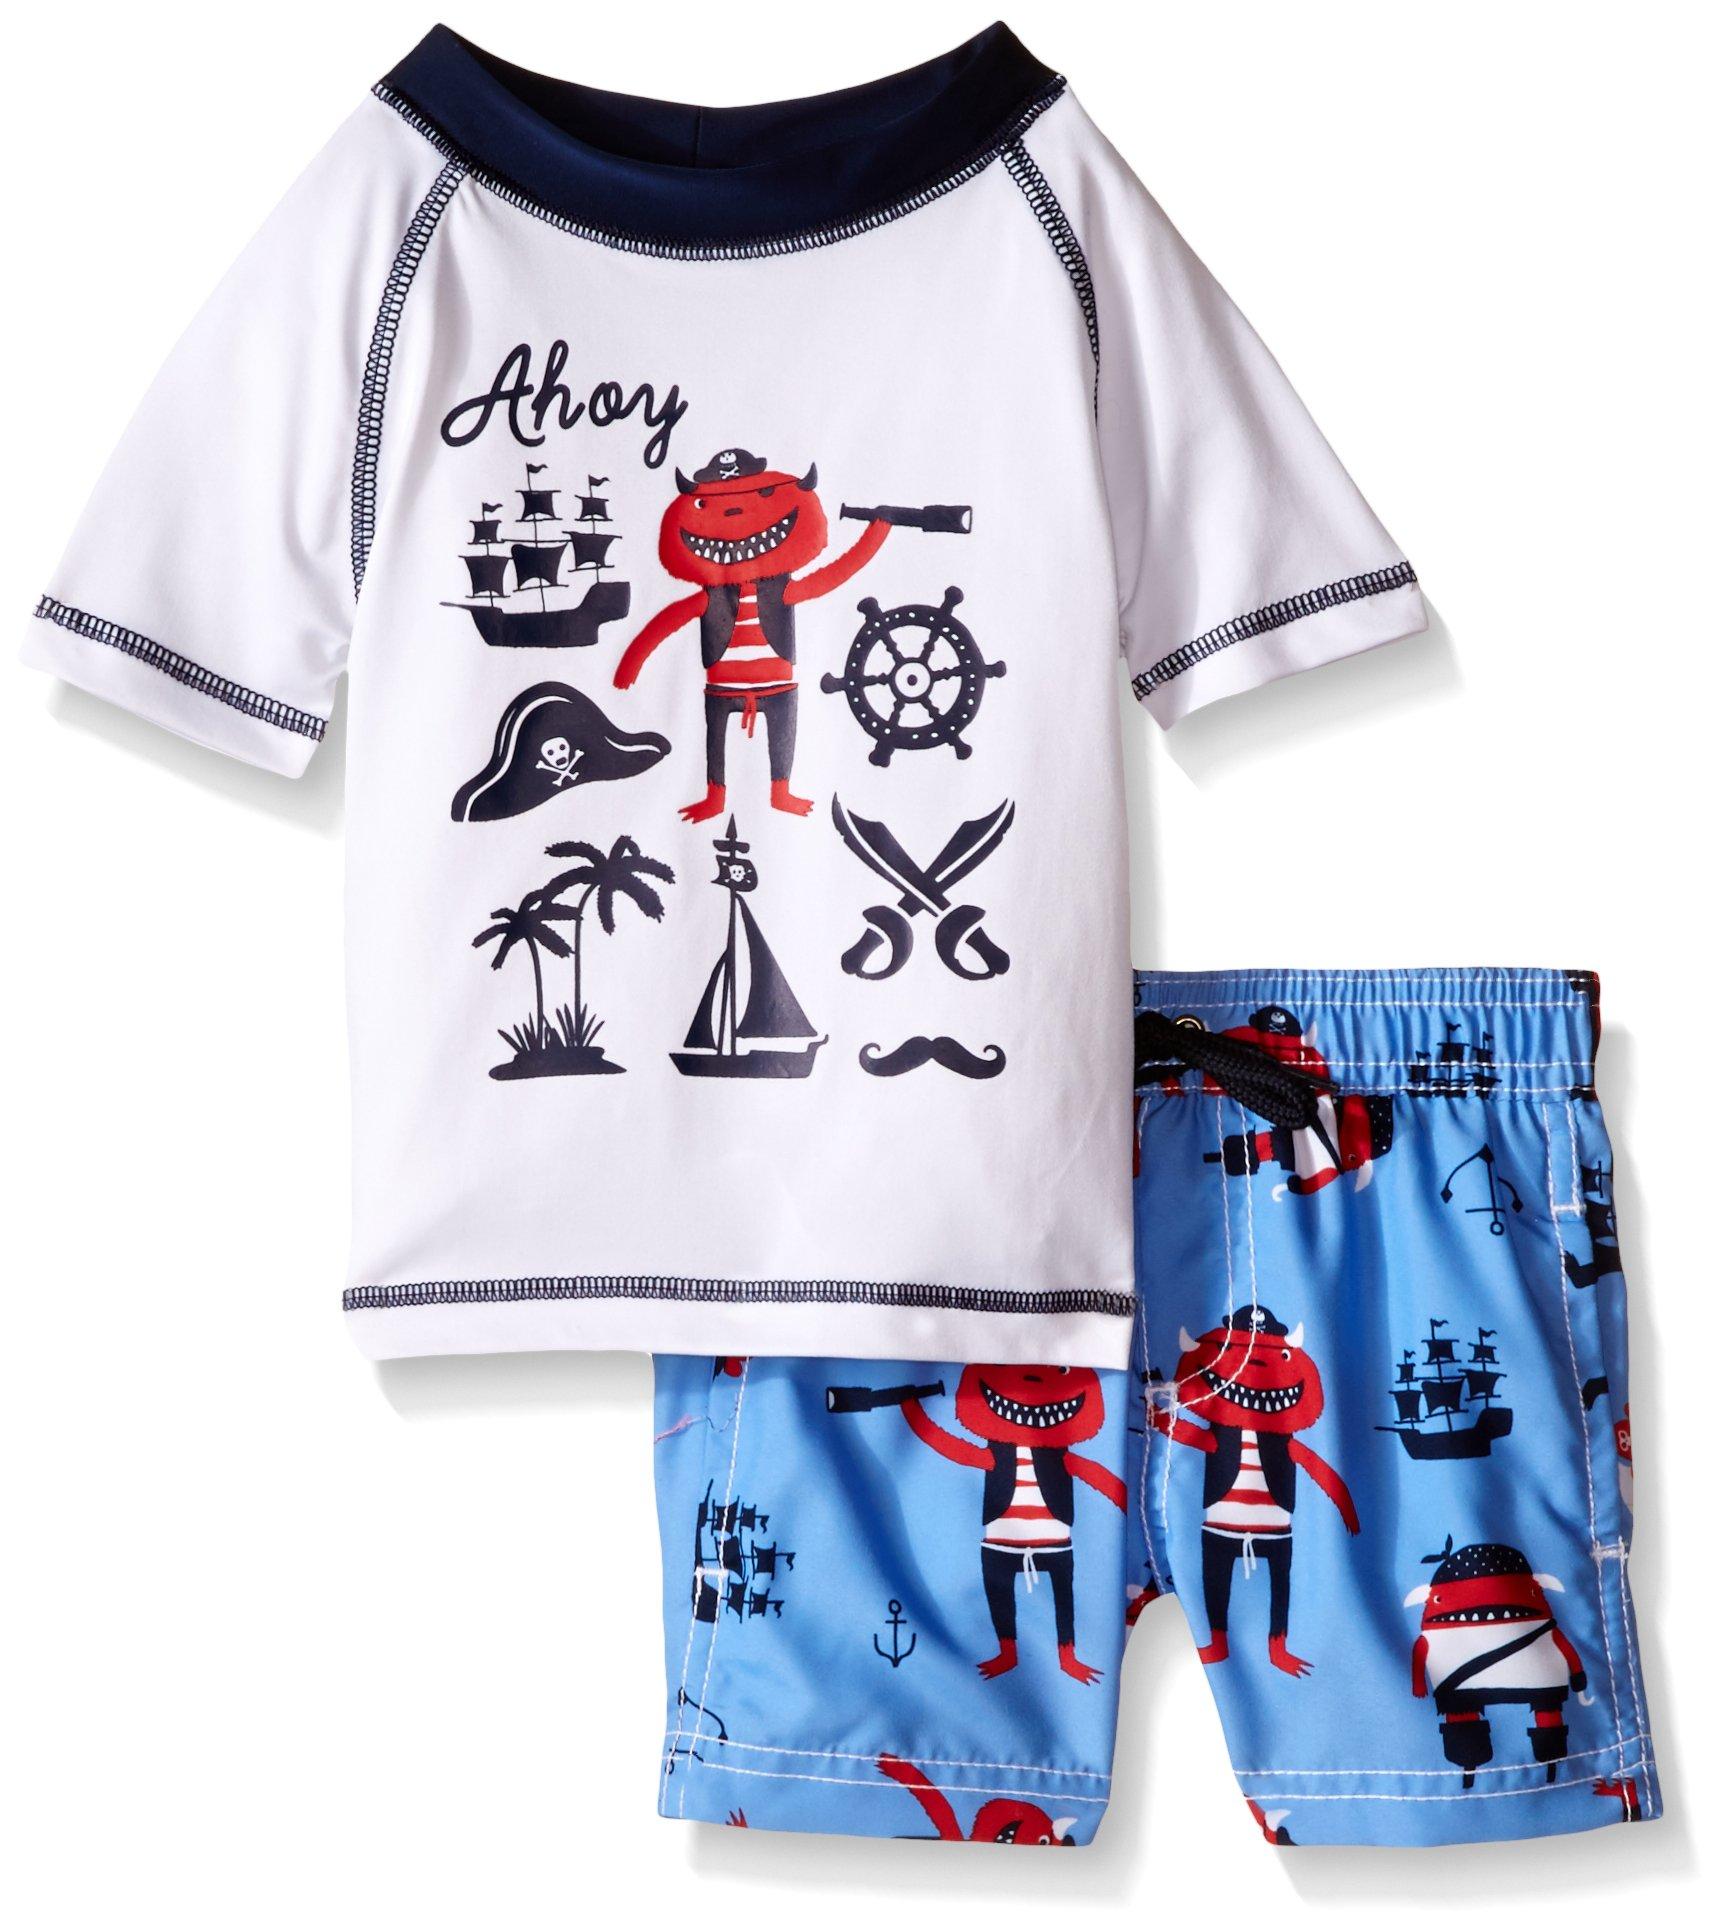 Wippette Boys Short Sleeve Rashguard Set with Hat Rash Guard Set